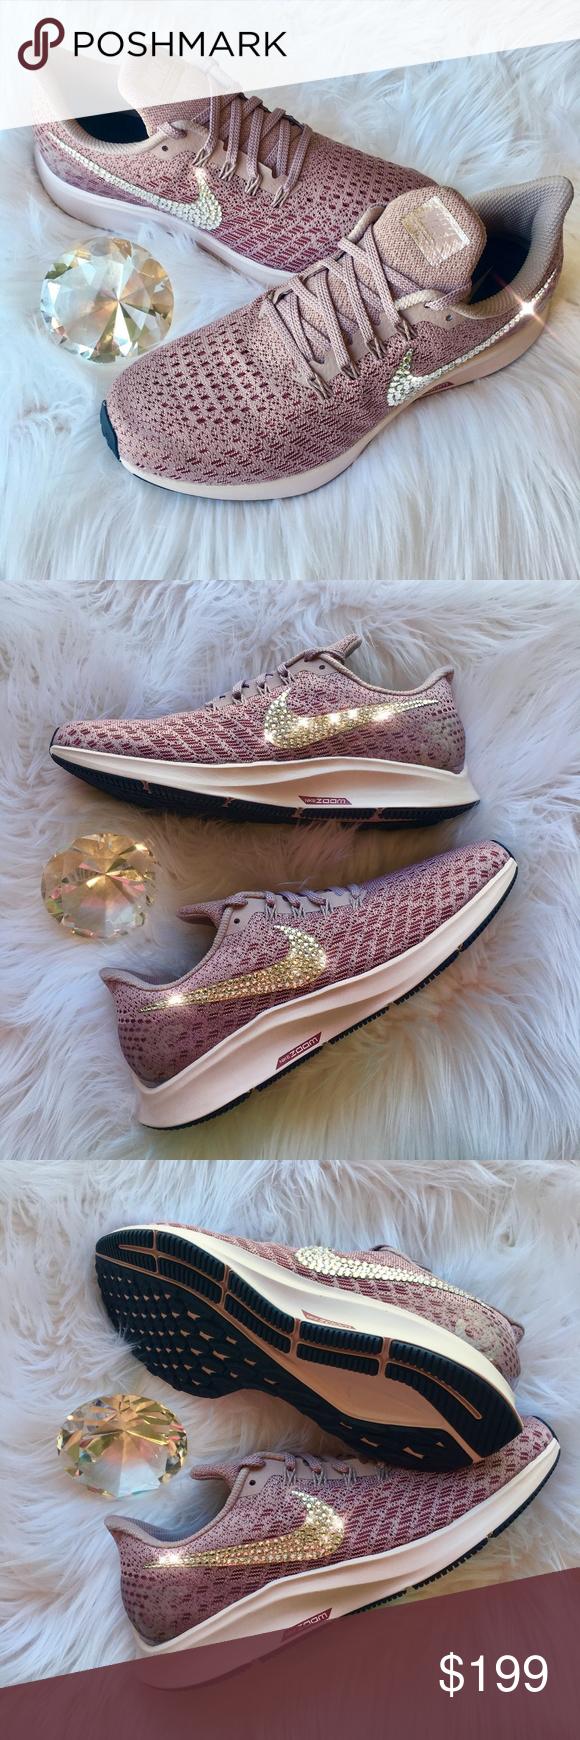 a1b19c52589 Bling Nike Pegasus 35 Shoes w  Swarovski Crystals STUNNING!! Brand New Nike  Air Zoom Pegasus 35 Women s Shoes with Swarovski Crystals on outside Logo  of ...